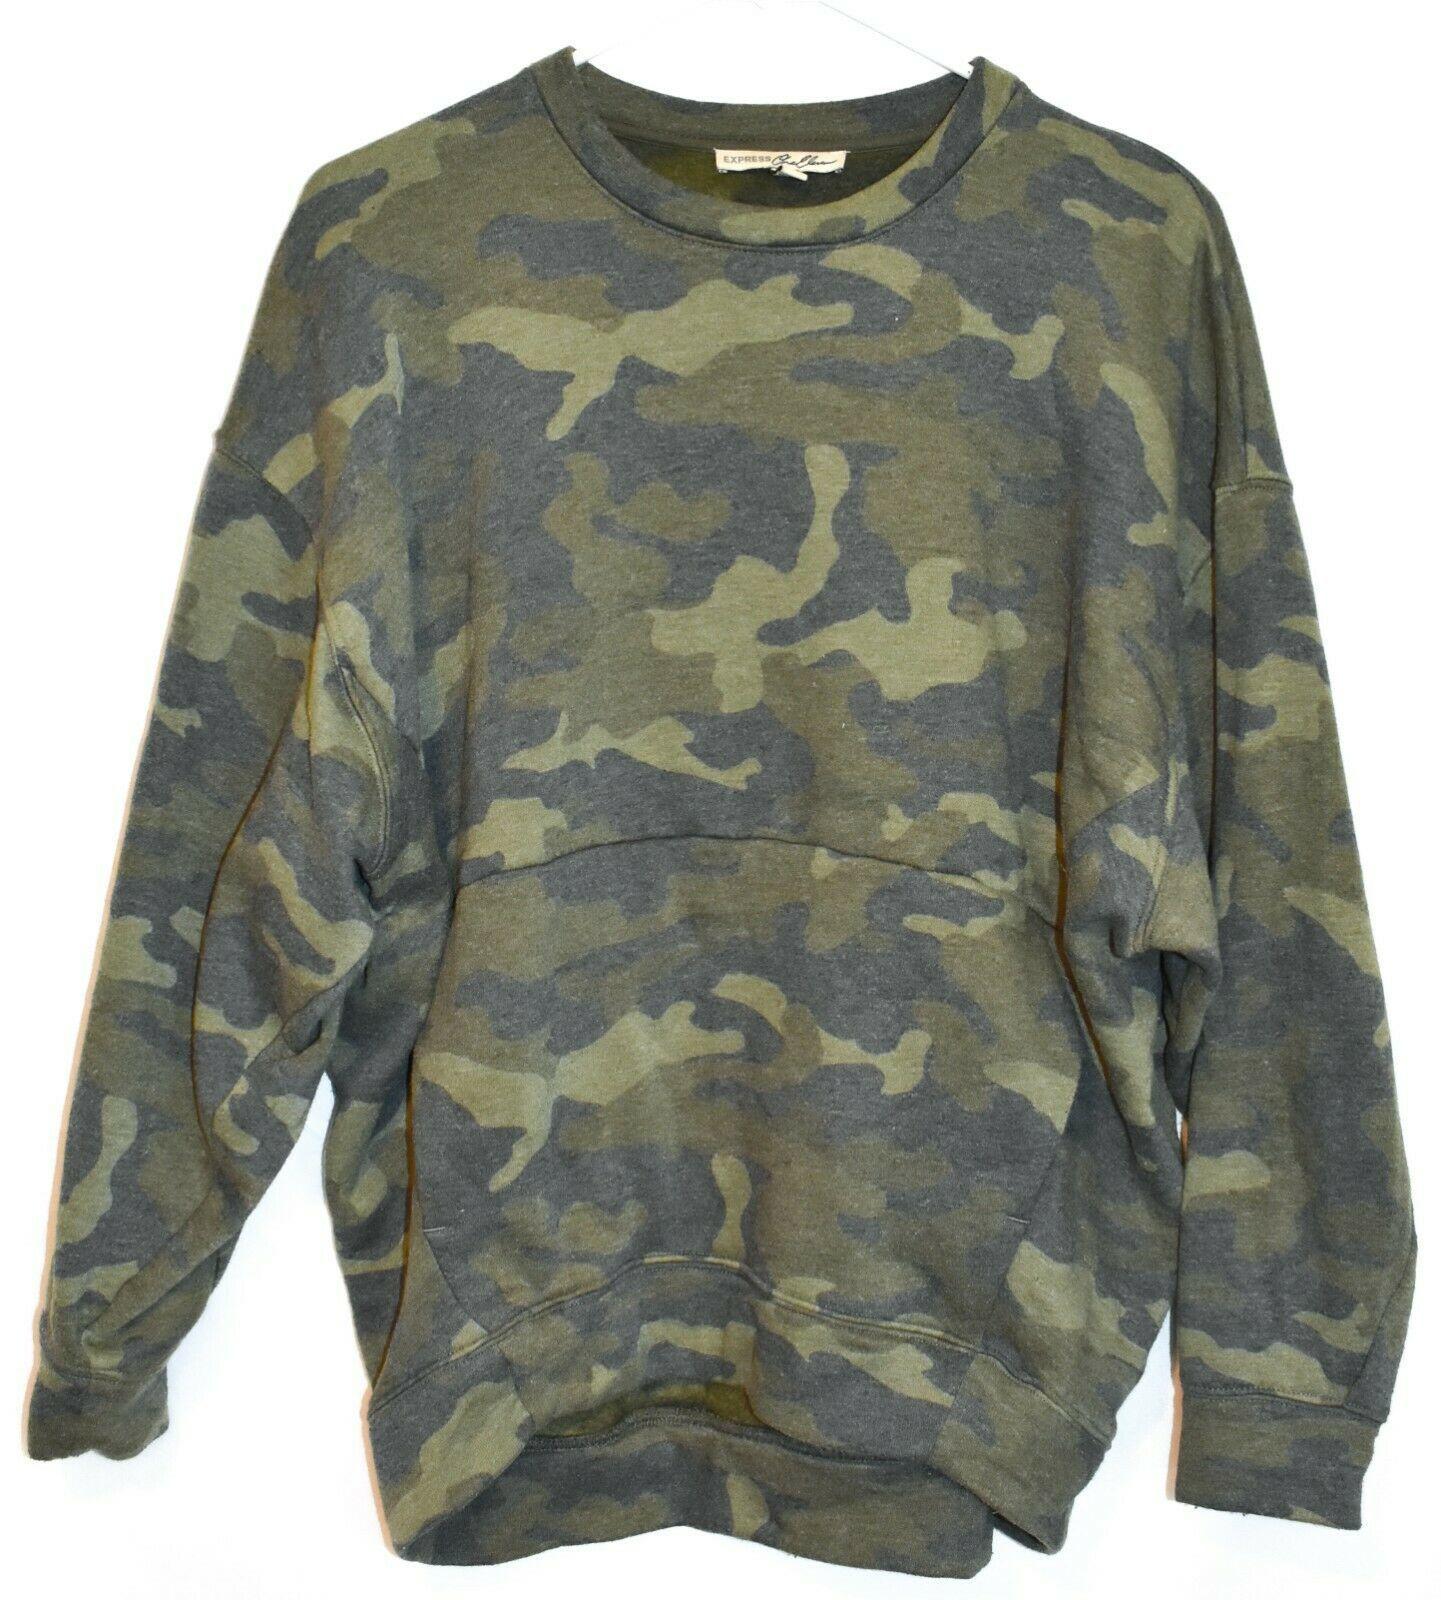 Express One Eleven Women's Faded Camo Crew Neck Front Pocket Sweatshirt Size S